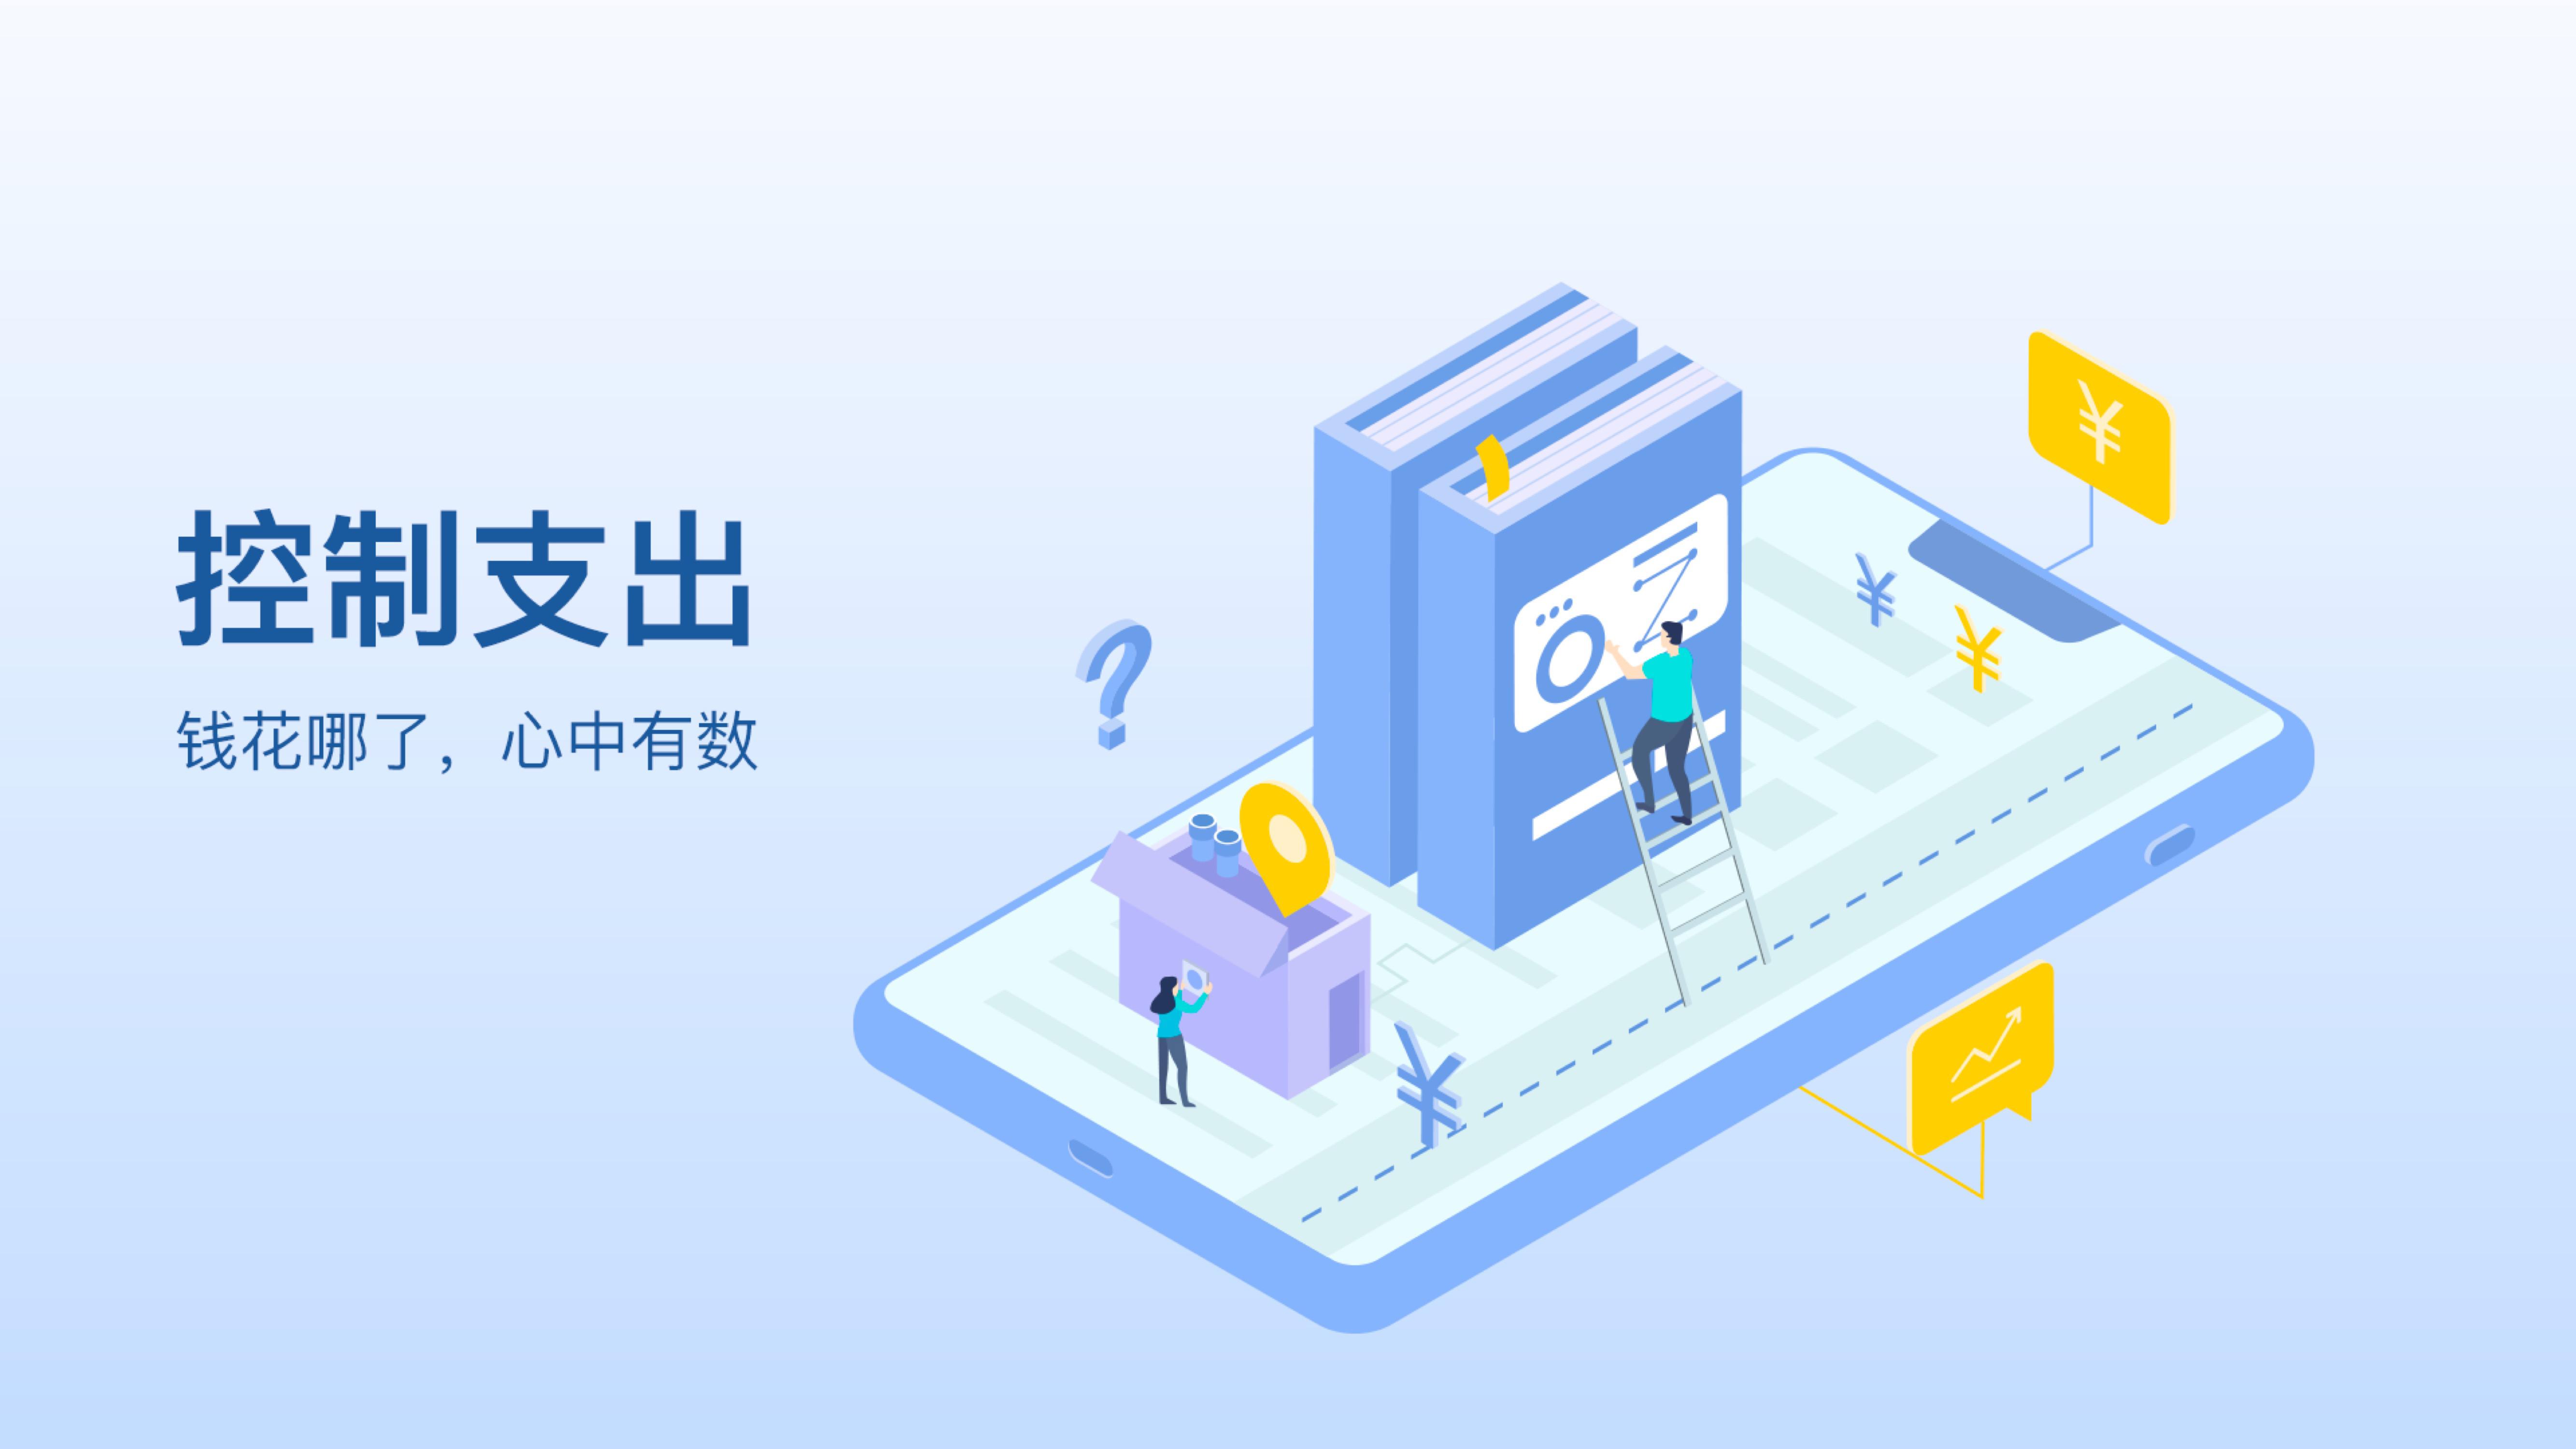 Ui设计 申佳琛 5年工作经验 14 10 23 2019